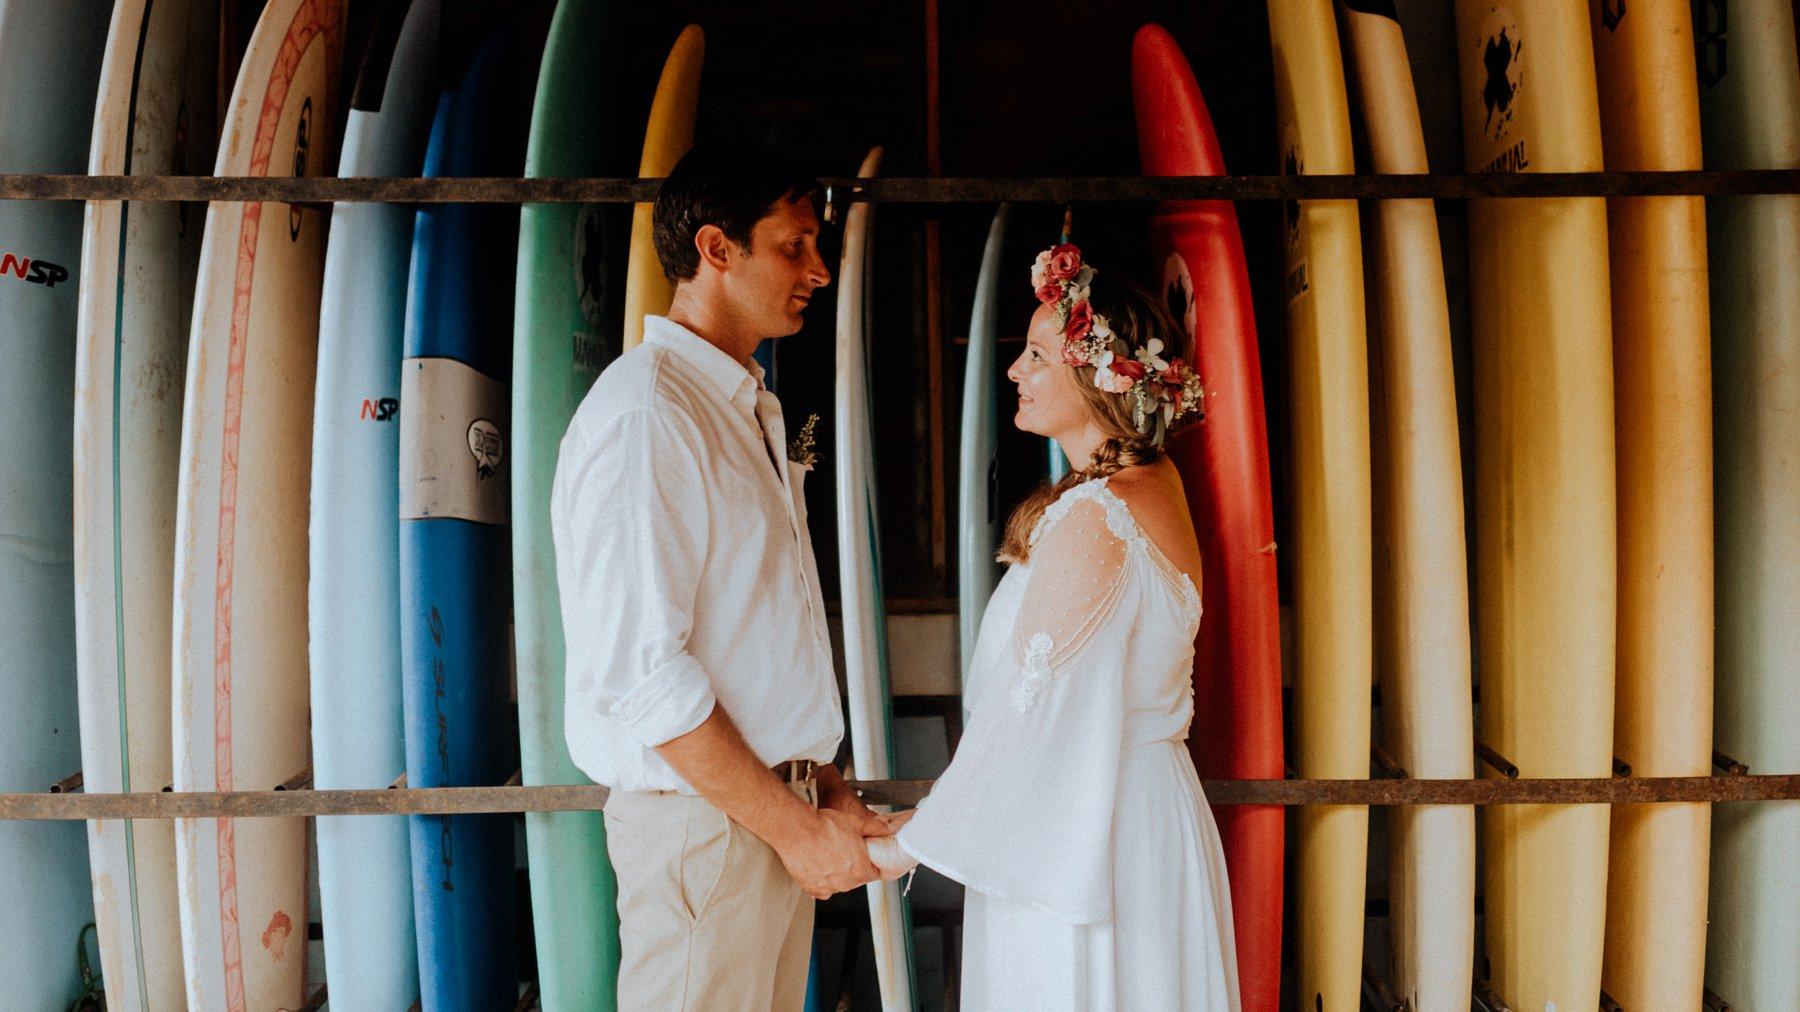 027-219-costa-rica-wedding-photographer-11.jpg